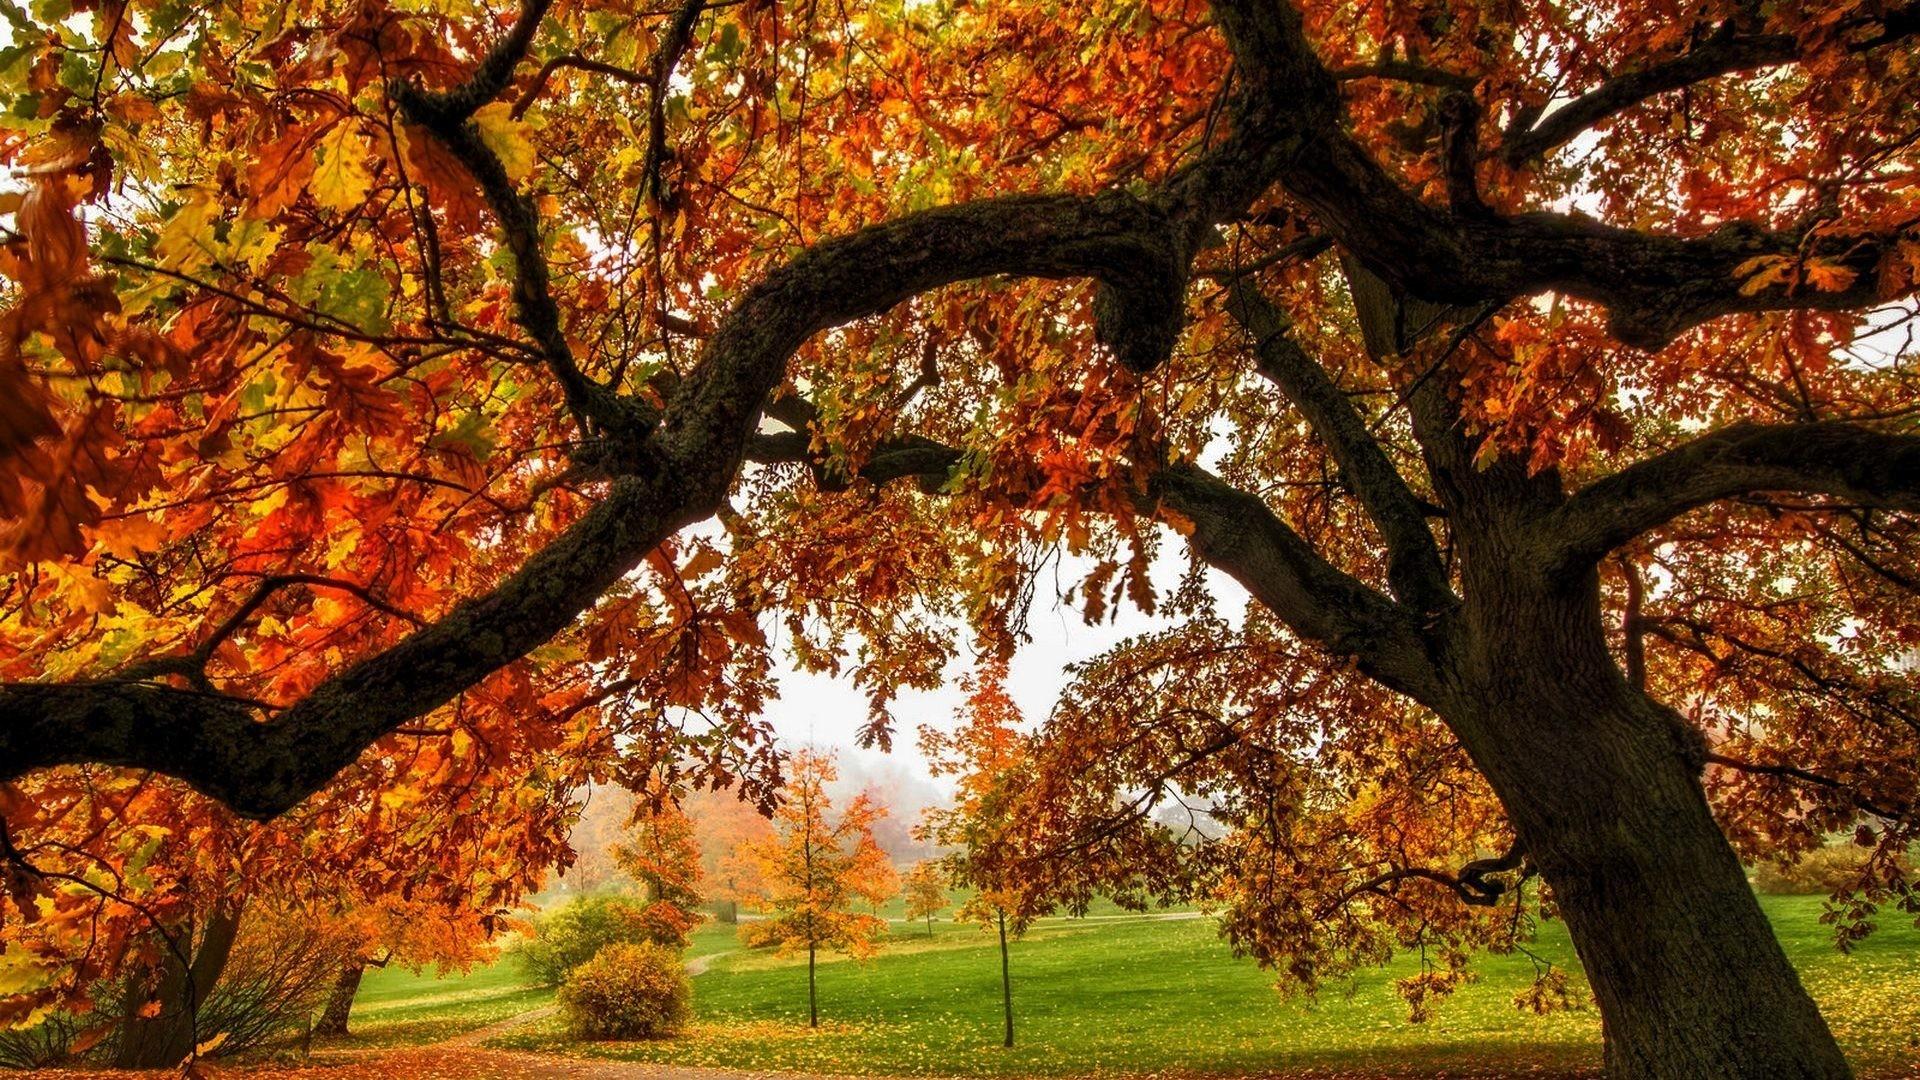 fall background image